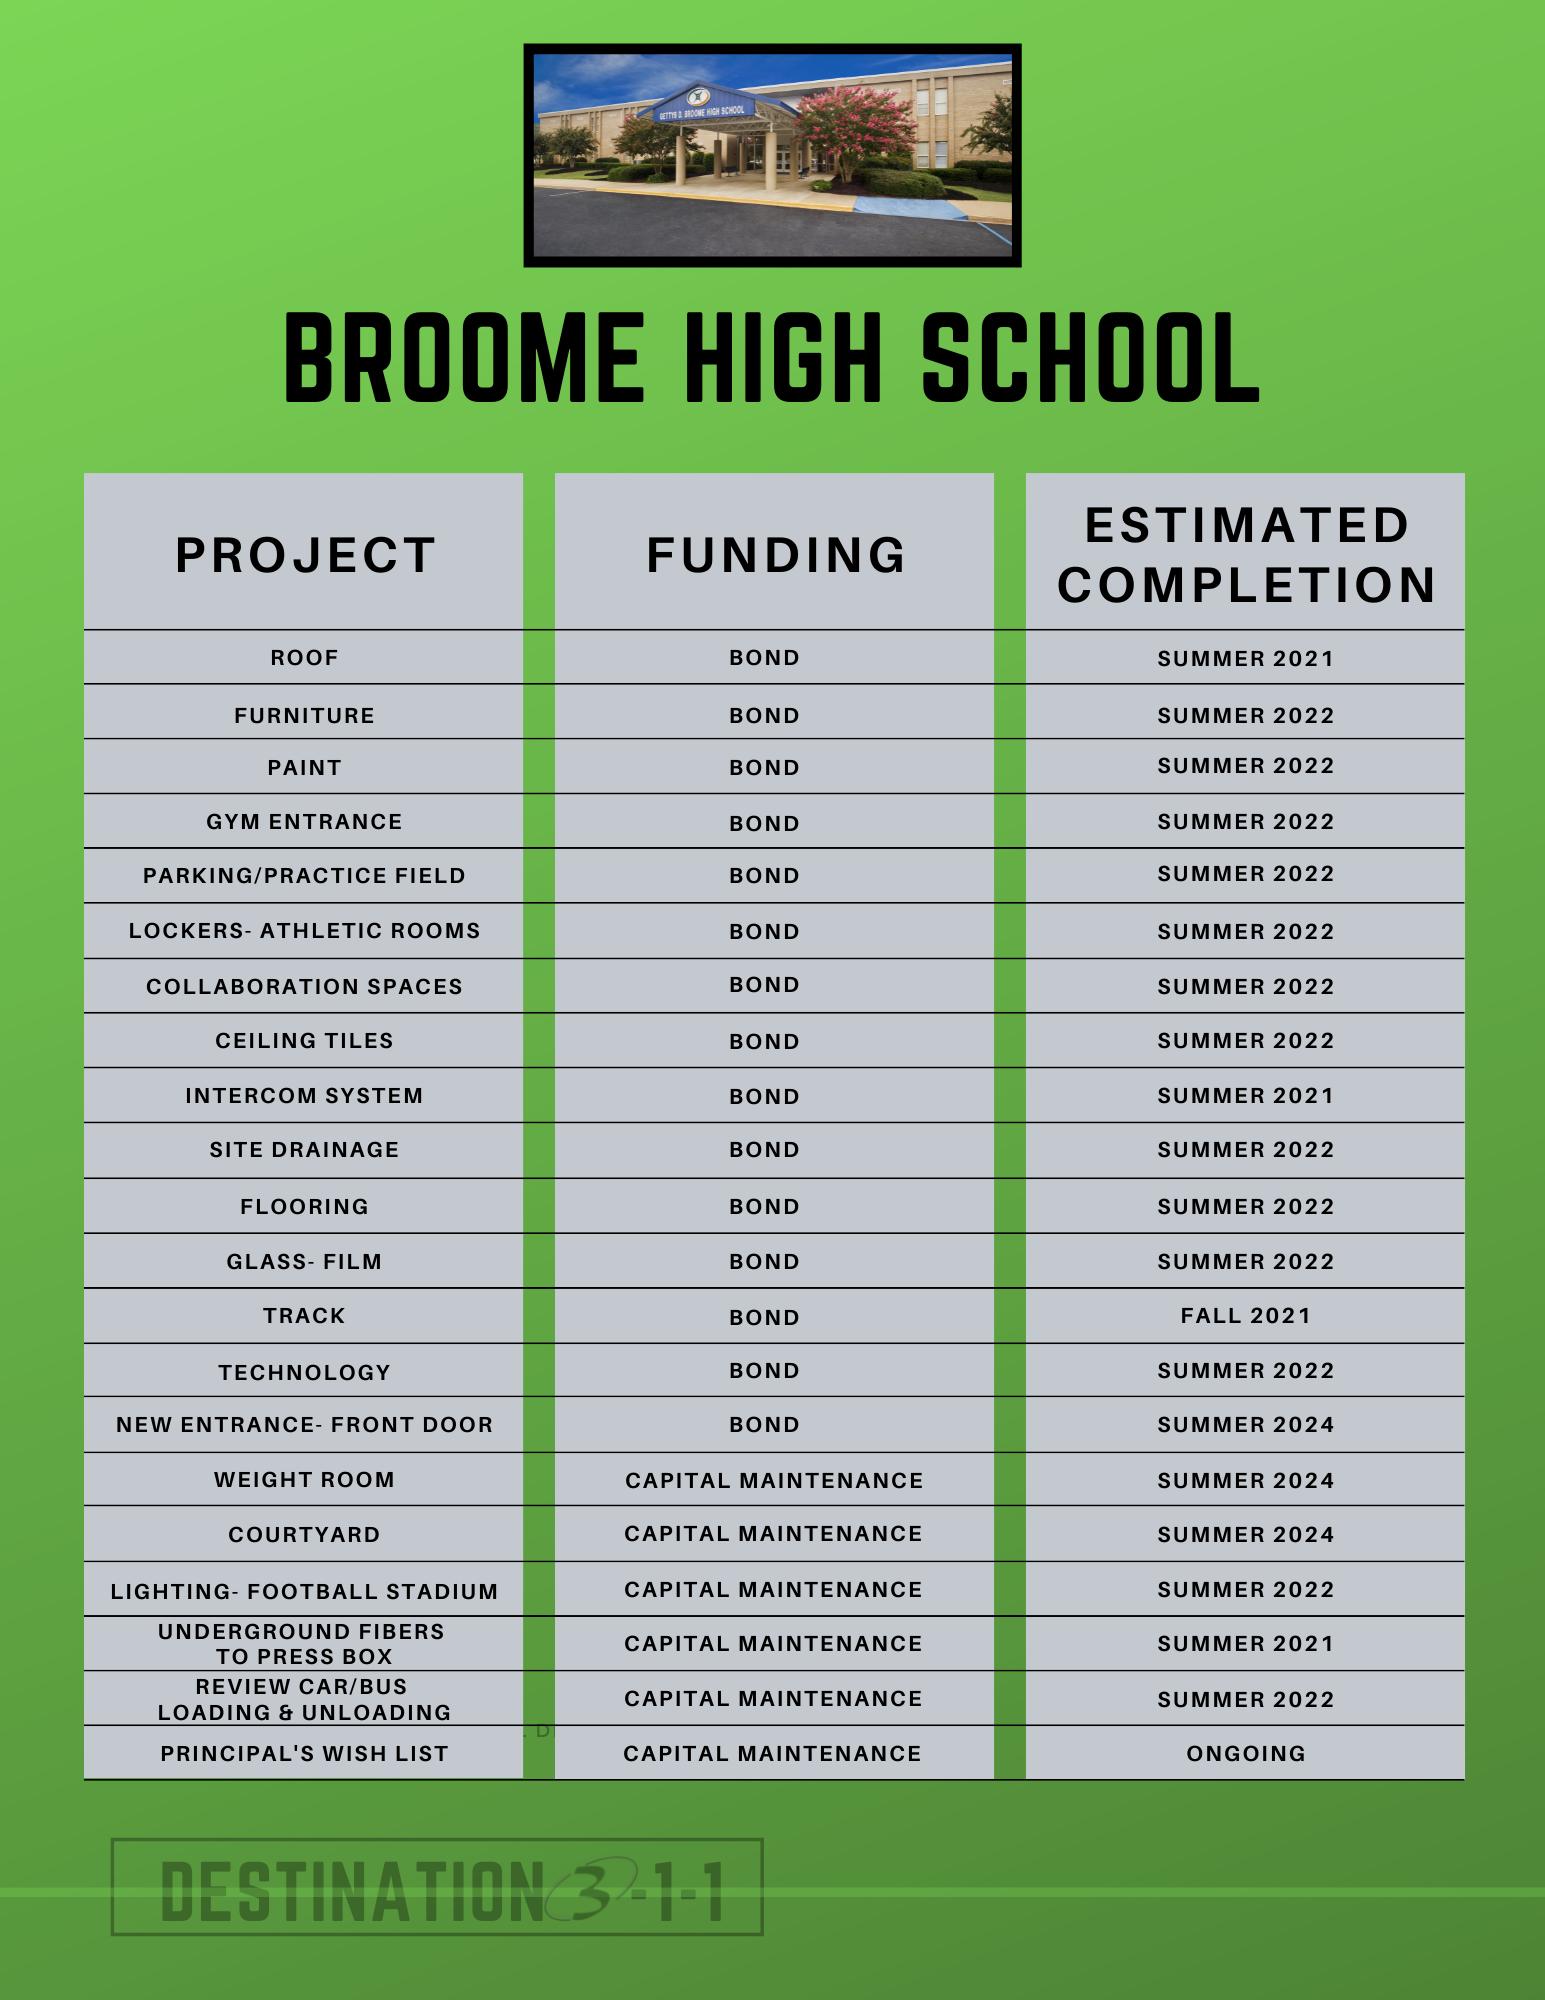 broome high school plans